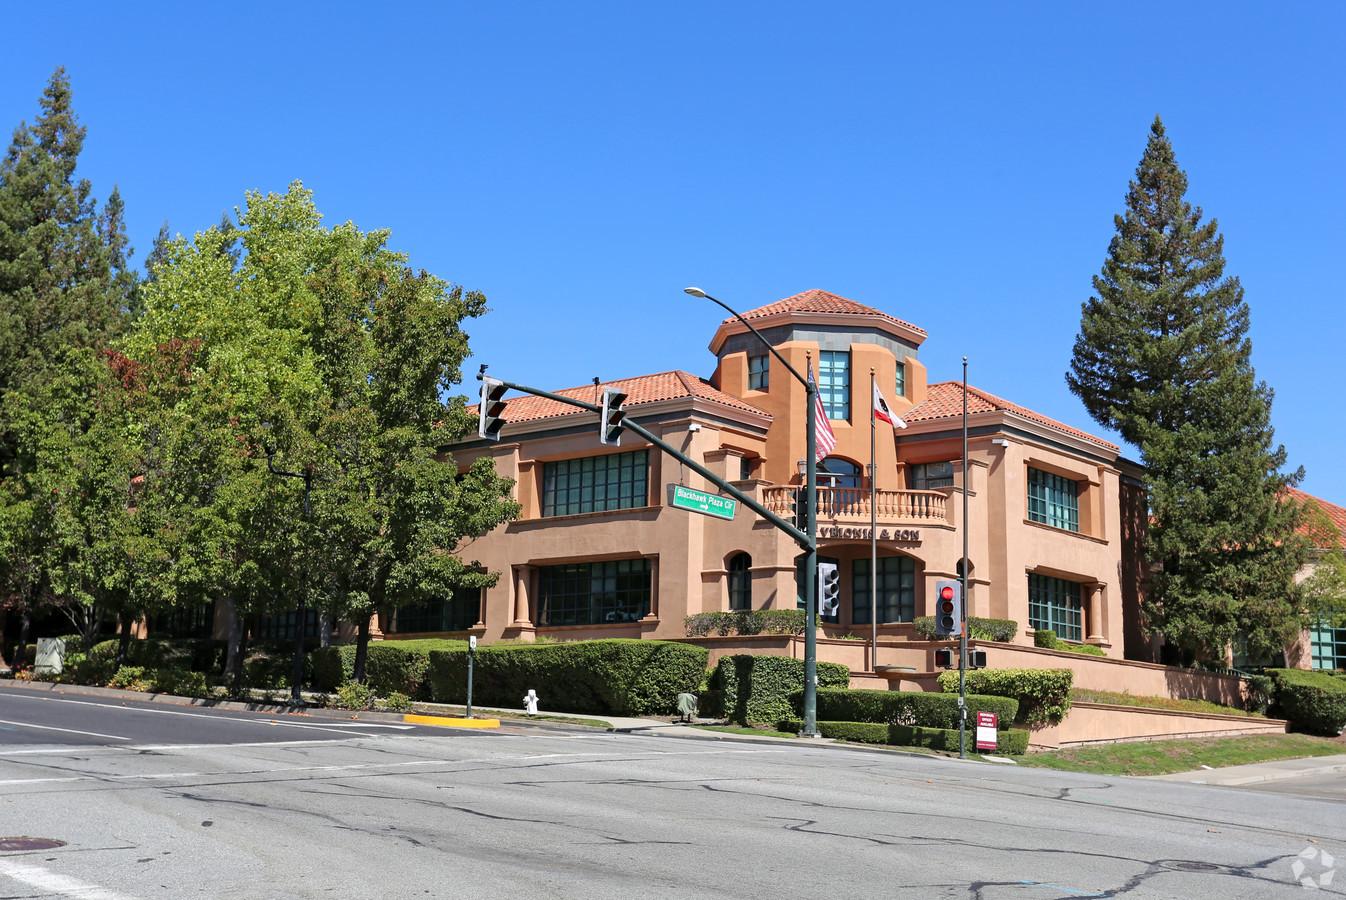 Danville, CA